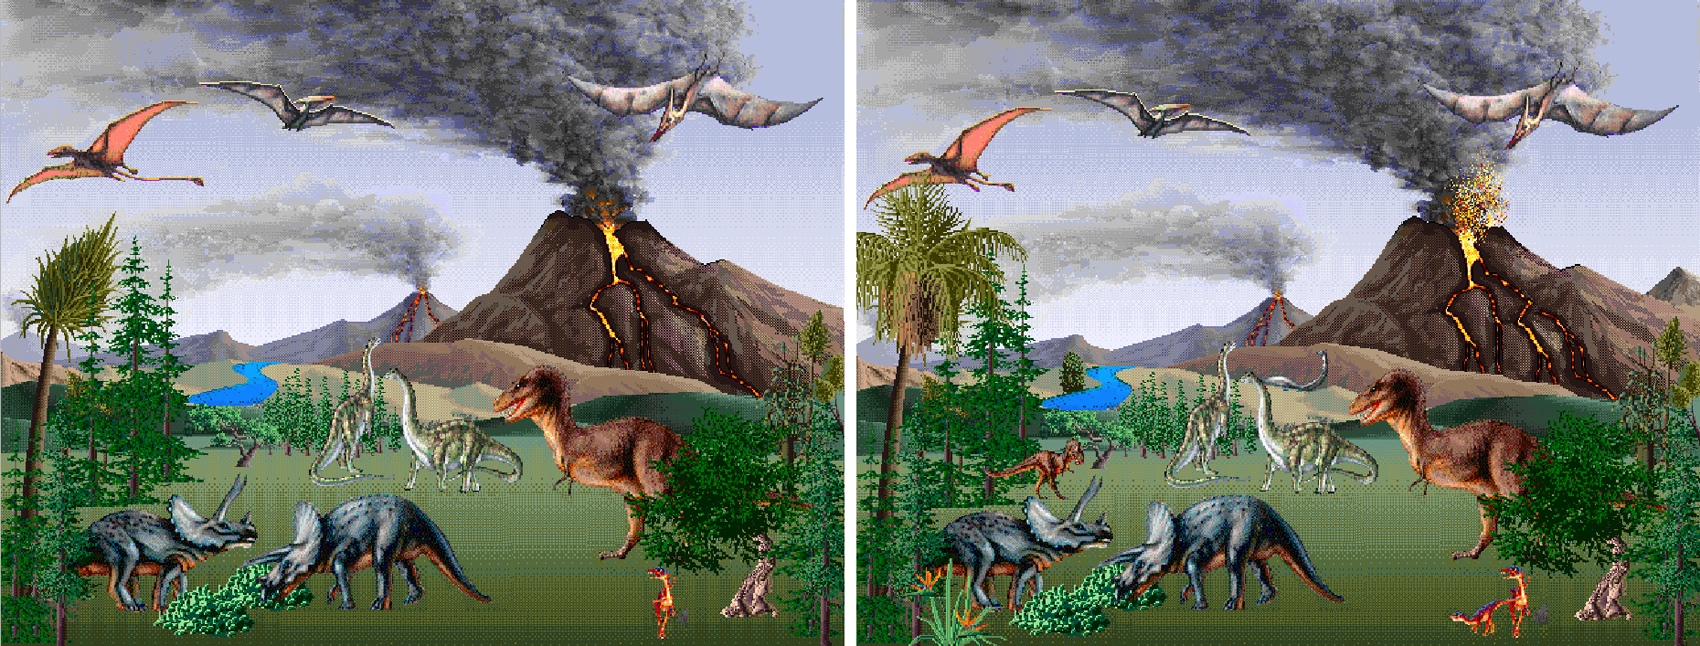 dinosaurs 2x